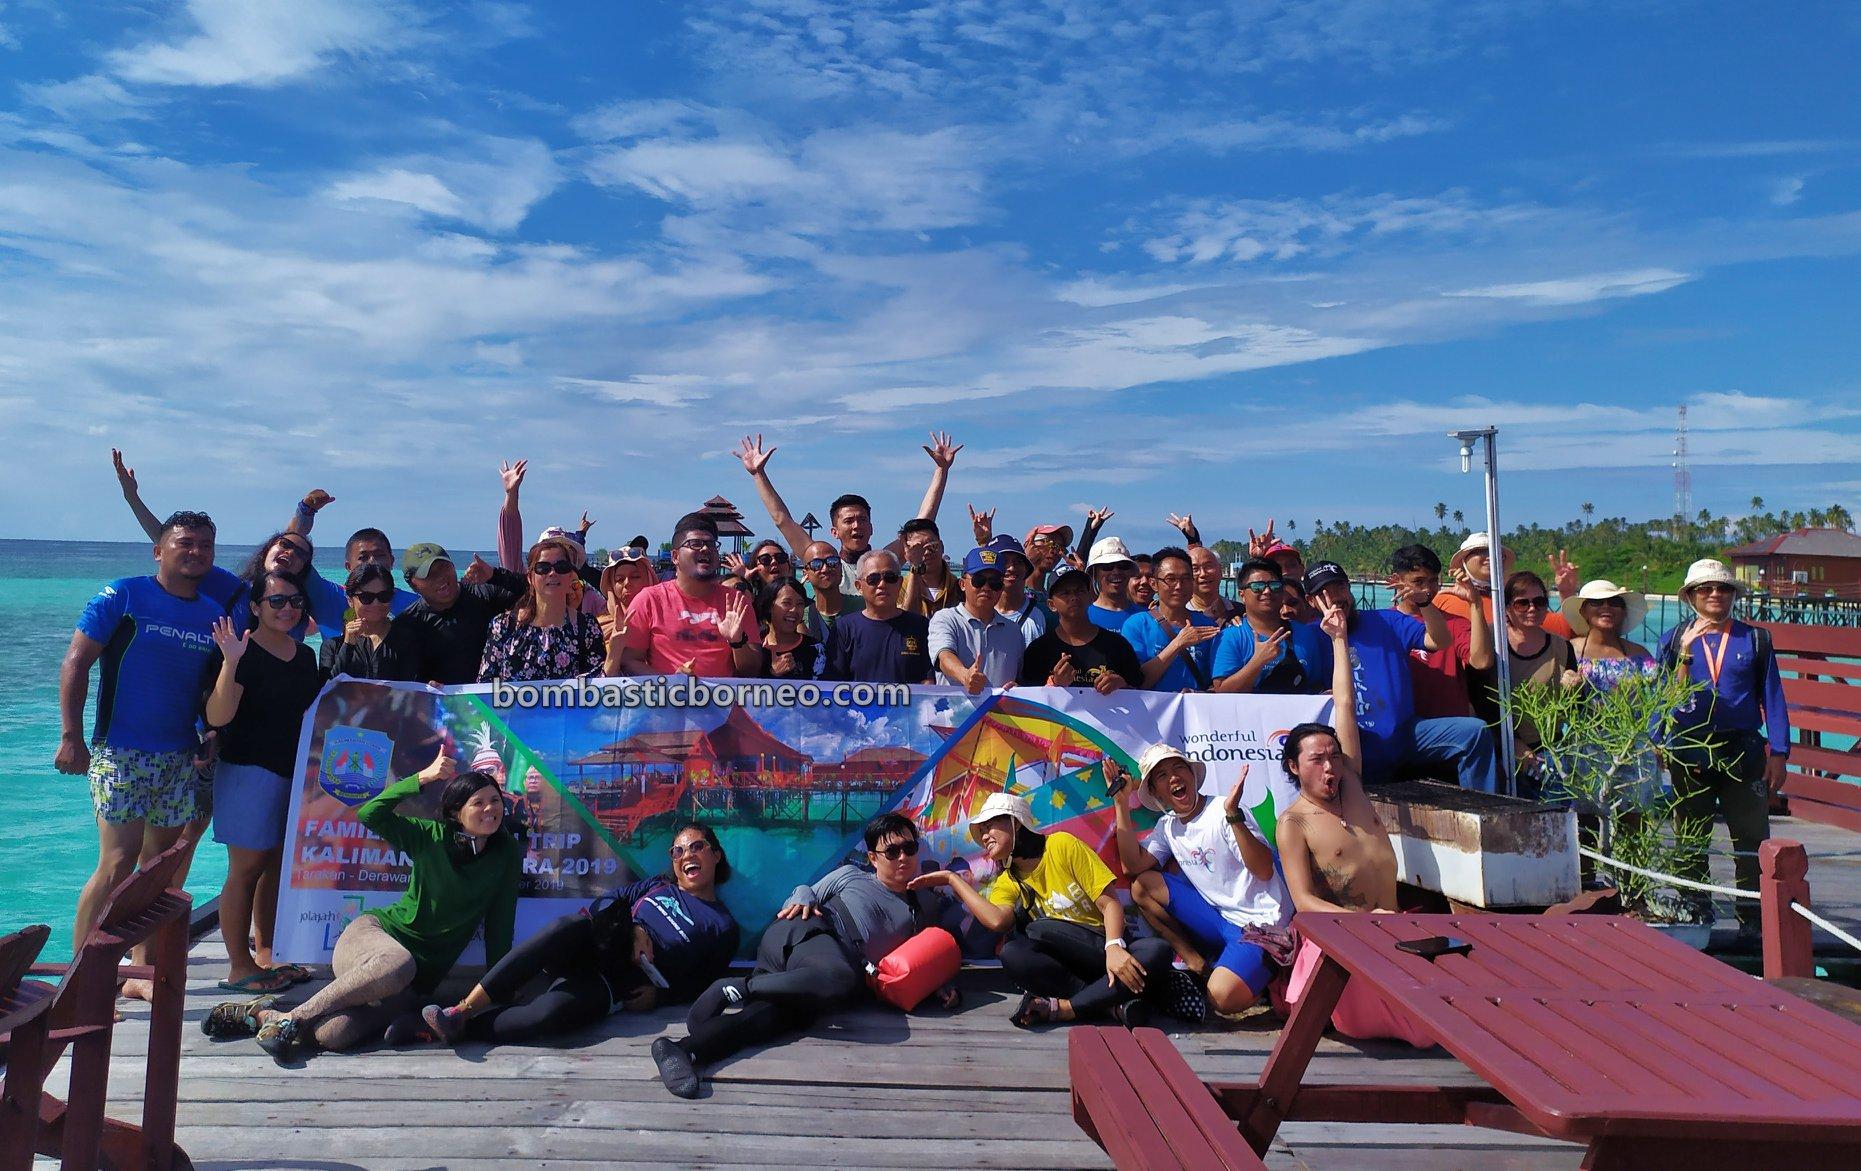 Kepulauan Derawan, backpackers, Diving spot, nature, hidden paradise, holiday, vacation, Berau, East Kalimantan, Pariwisata, Tourist attraction, travel guide, Trans Borneo, 印尼东加里曼丹, 马拉图拉岛旅游景点